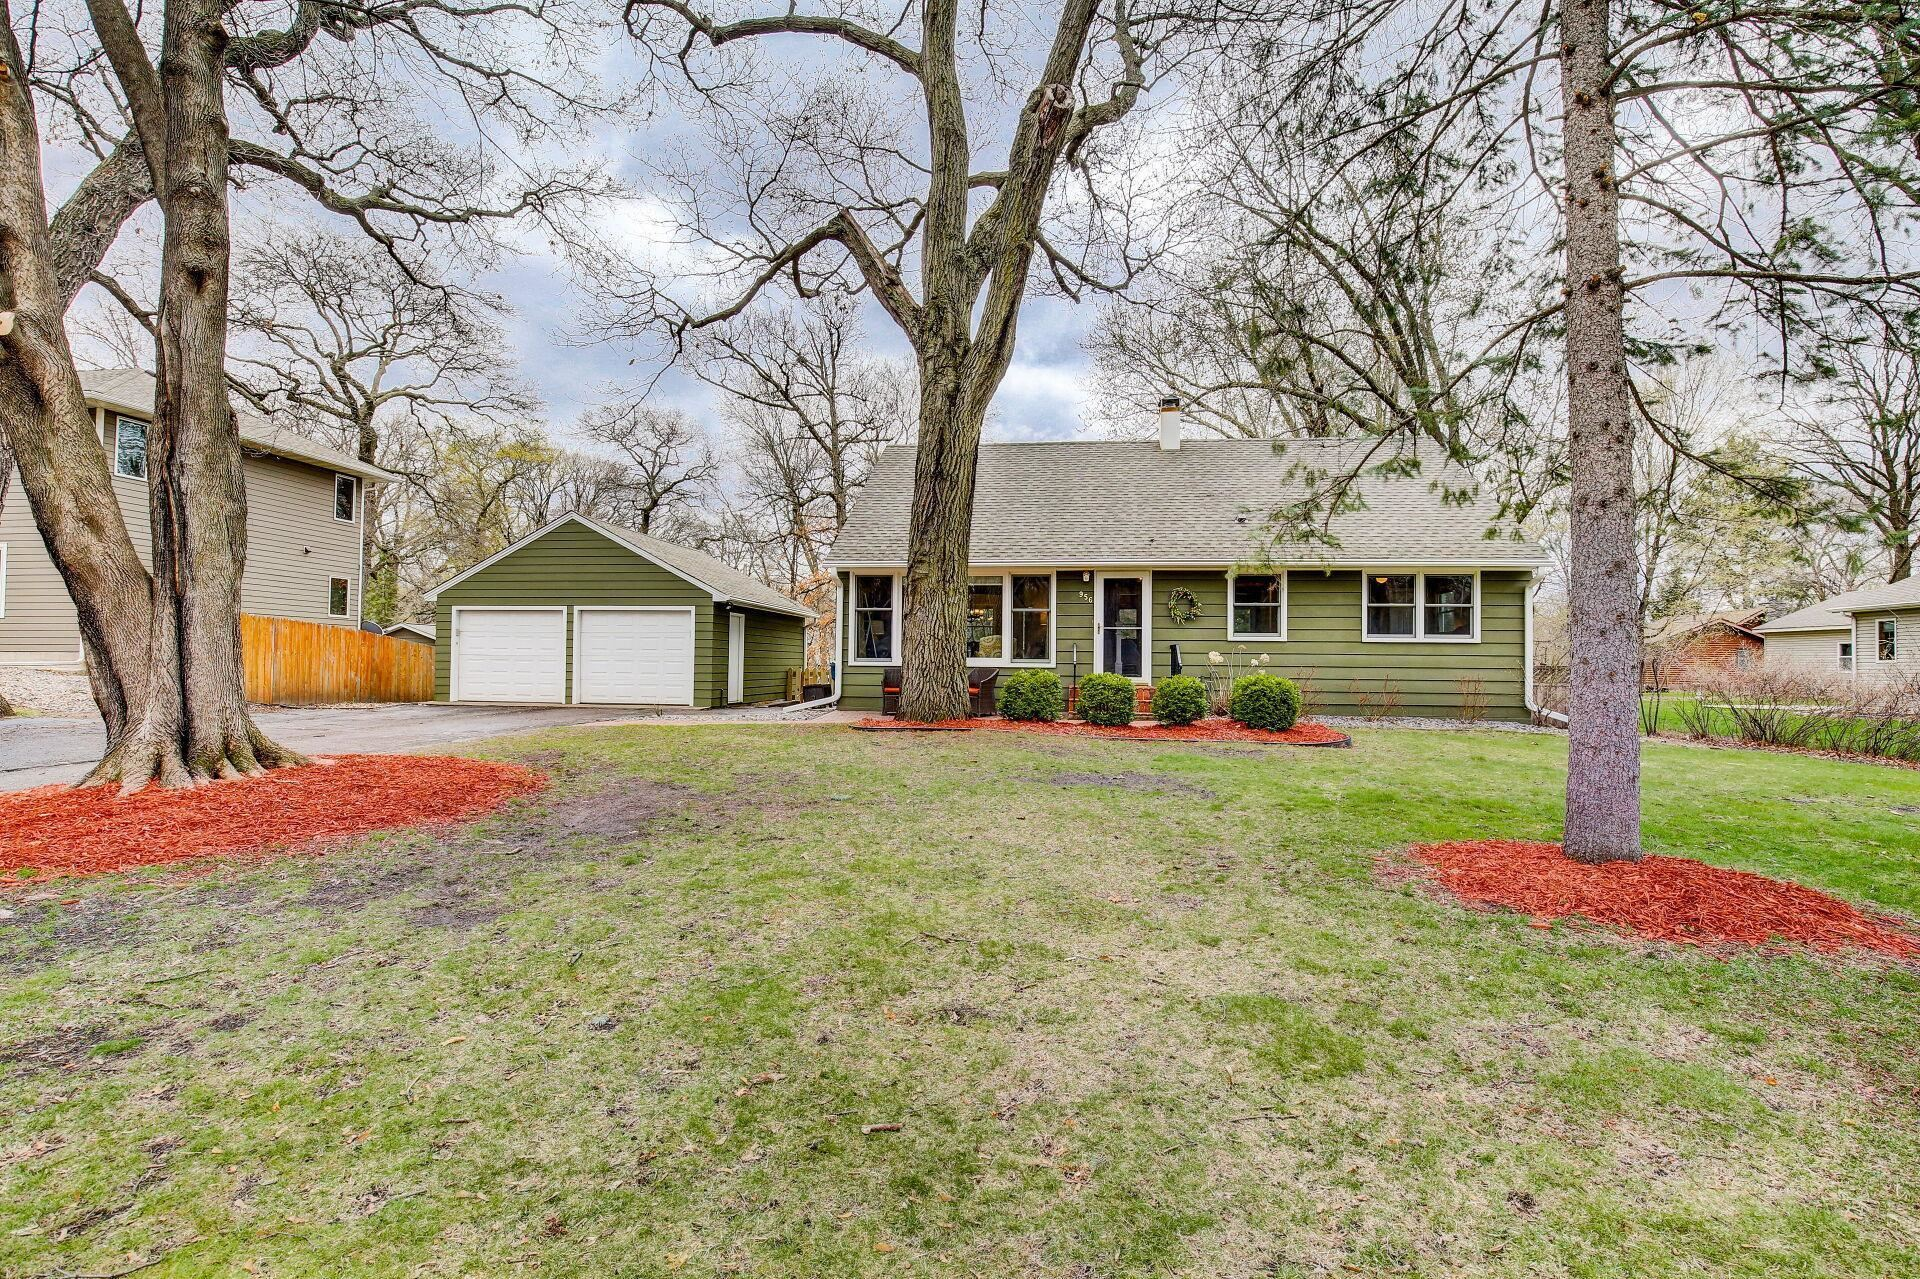 956 Robinhood Place, Shoreview, MN 55126 - MLS#: 5735301